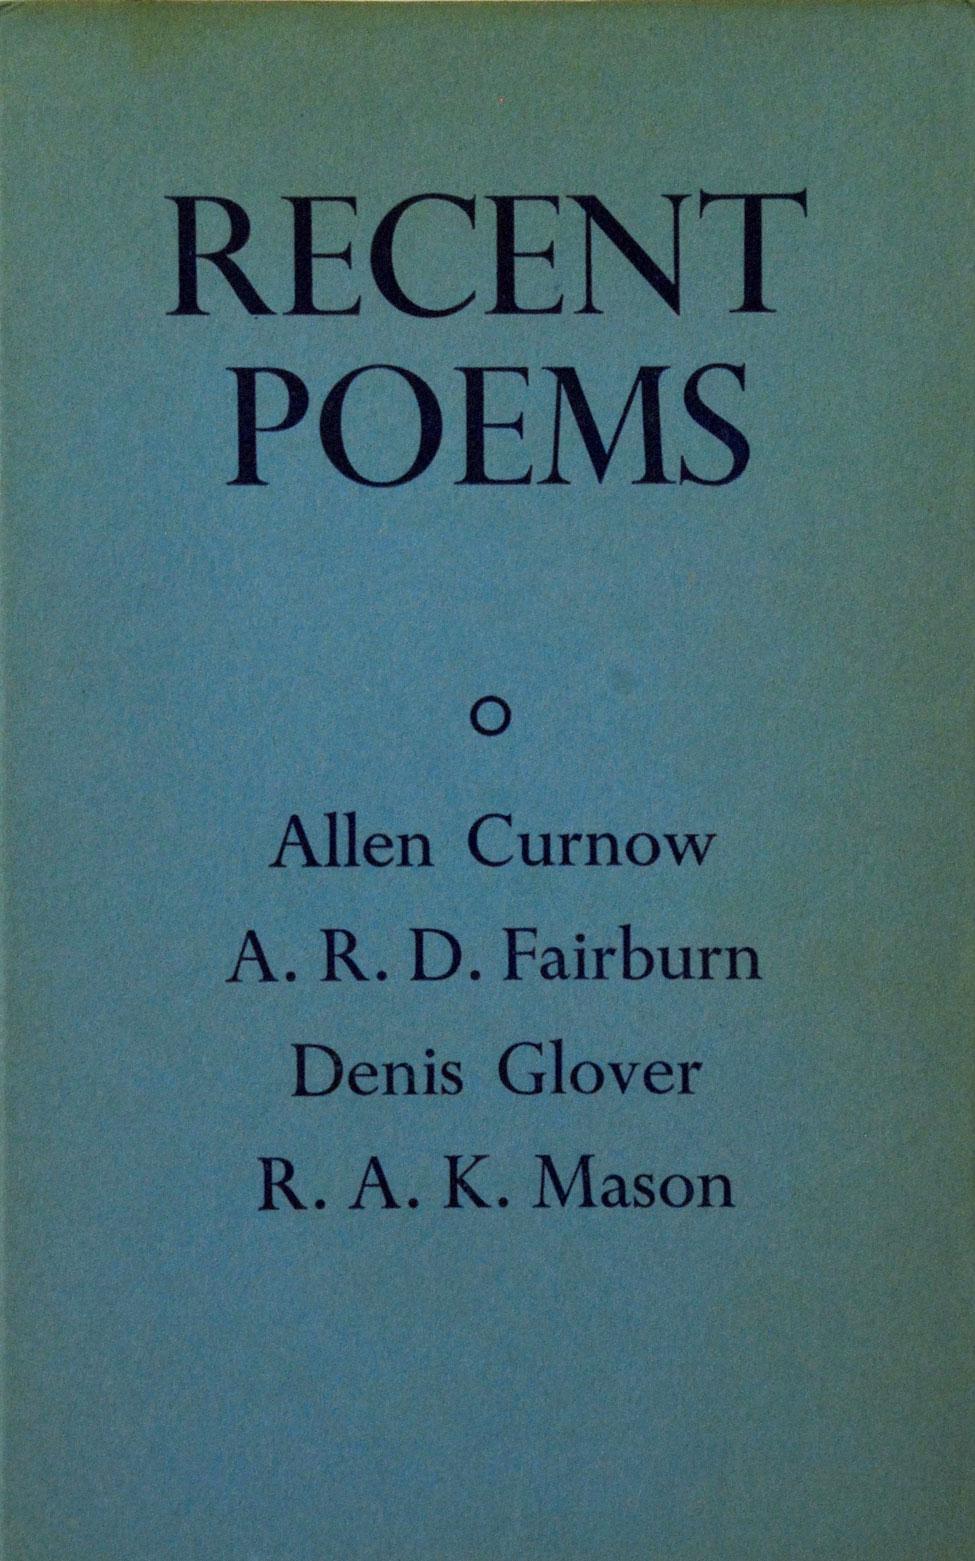 Recent Poems: Allen Curnow, A. R. D. Fairburn, Denis Glover, R. A. K. Mason. <i>Christchurch: The Caxton Press, 1941.</i>